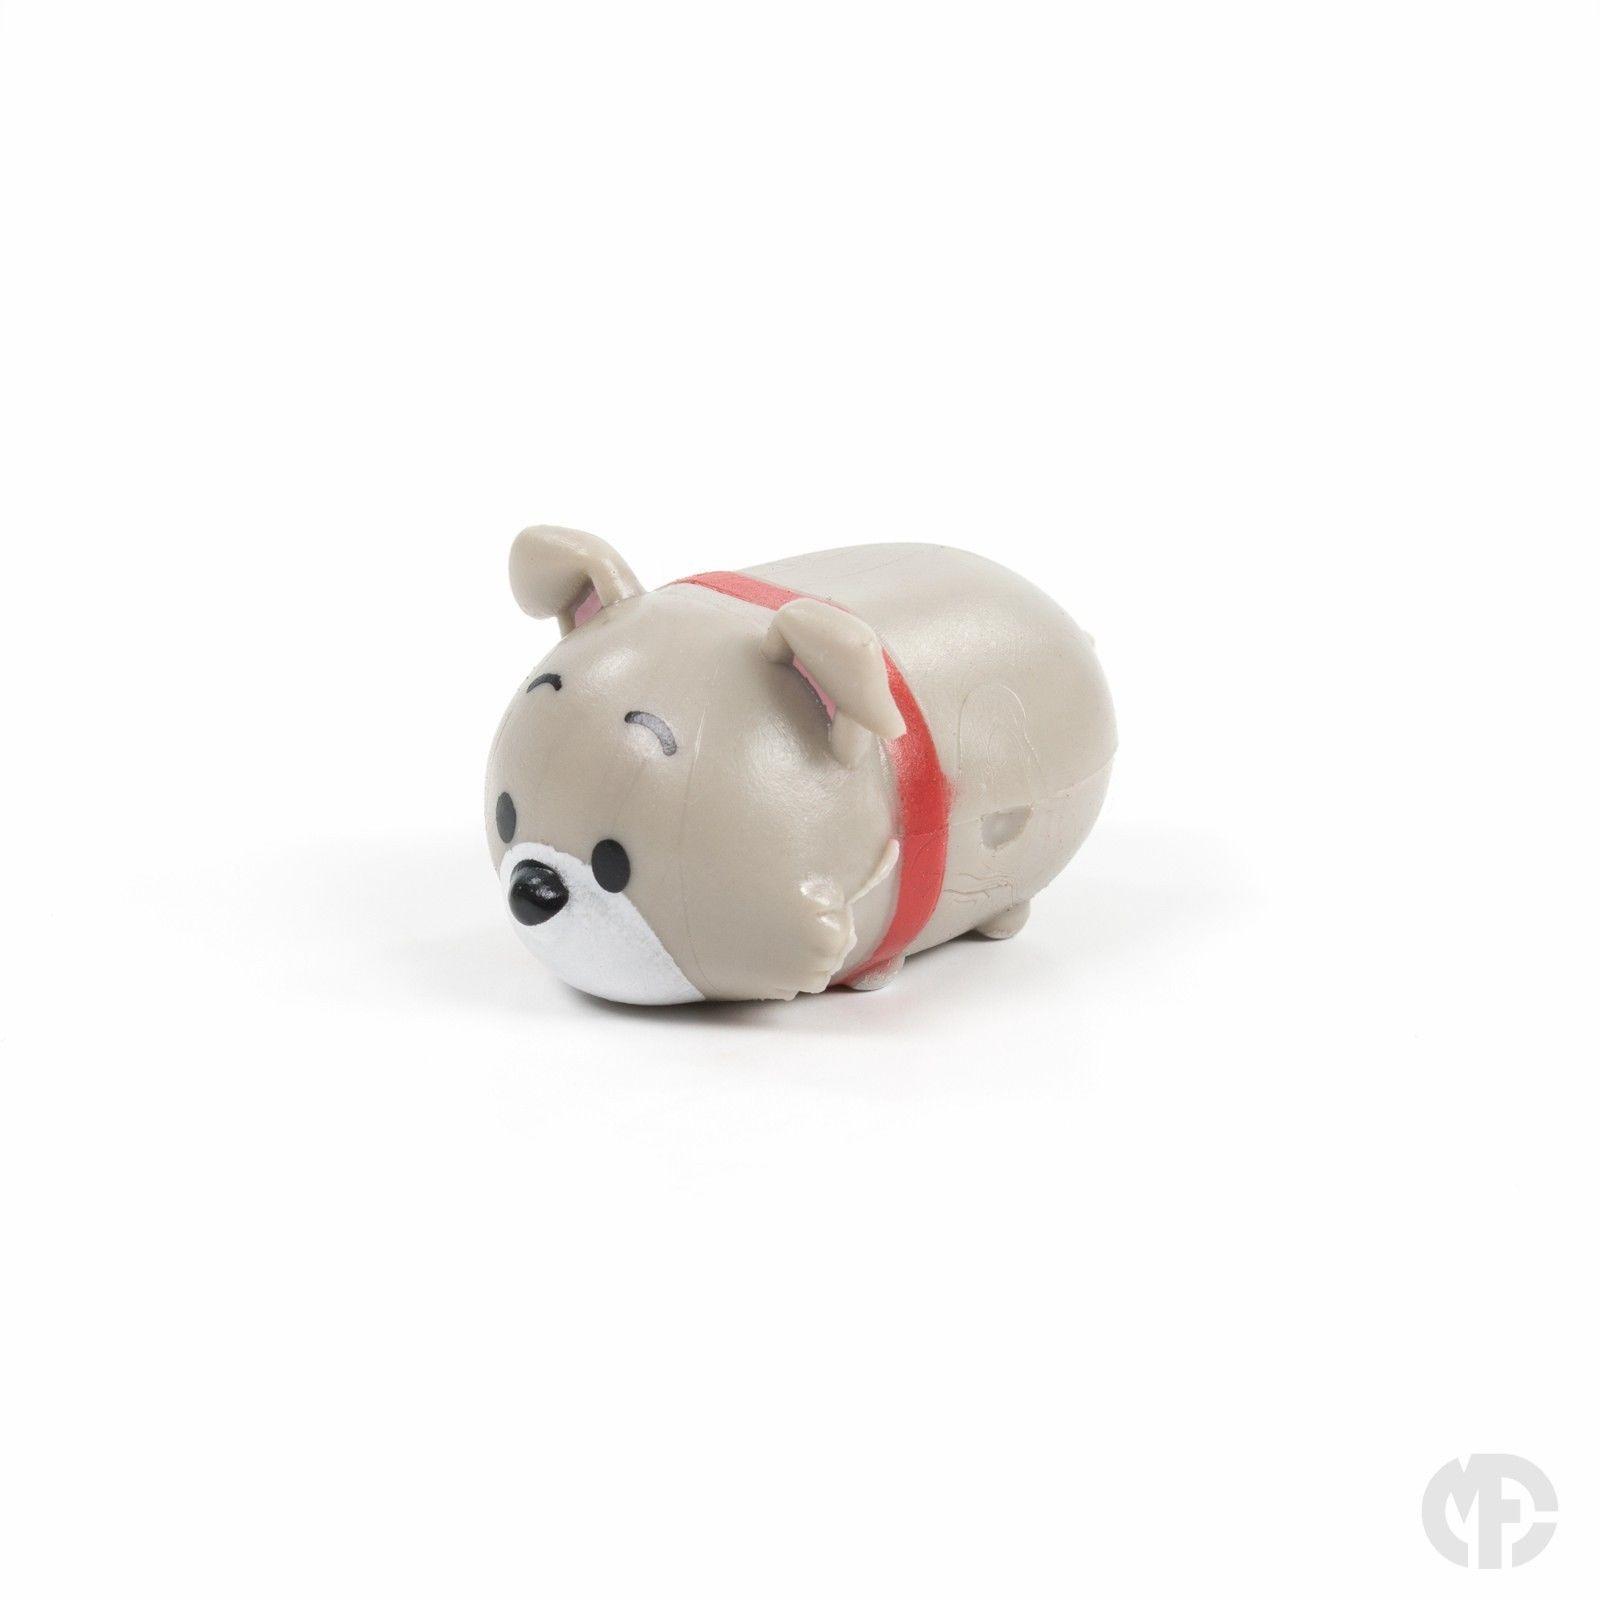 Squishy Rubber Toys : TSUM TSUM Squishy Figures DISNEY rubber - Random mixes -SERIES 1! eBay